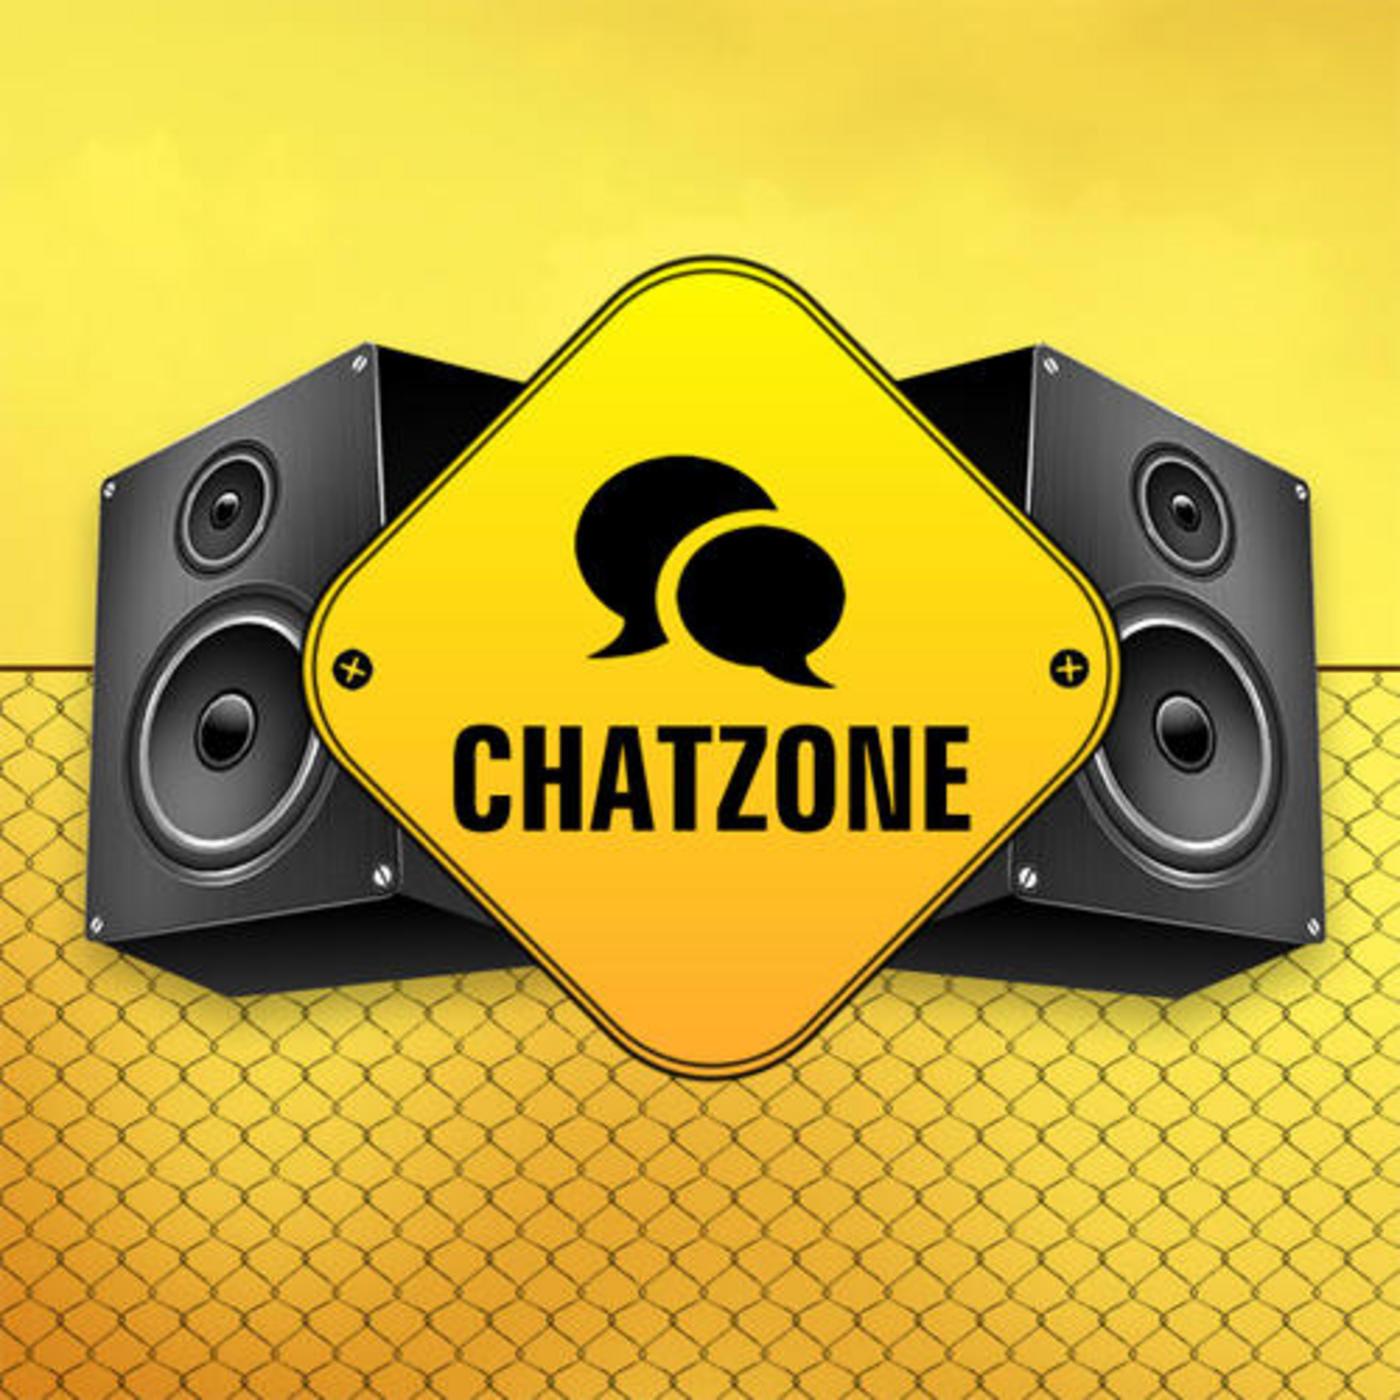 Chat zone - 25/04/2016 en Chatzone en mp3(26/04 a las 09